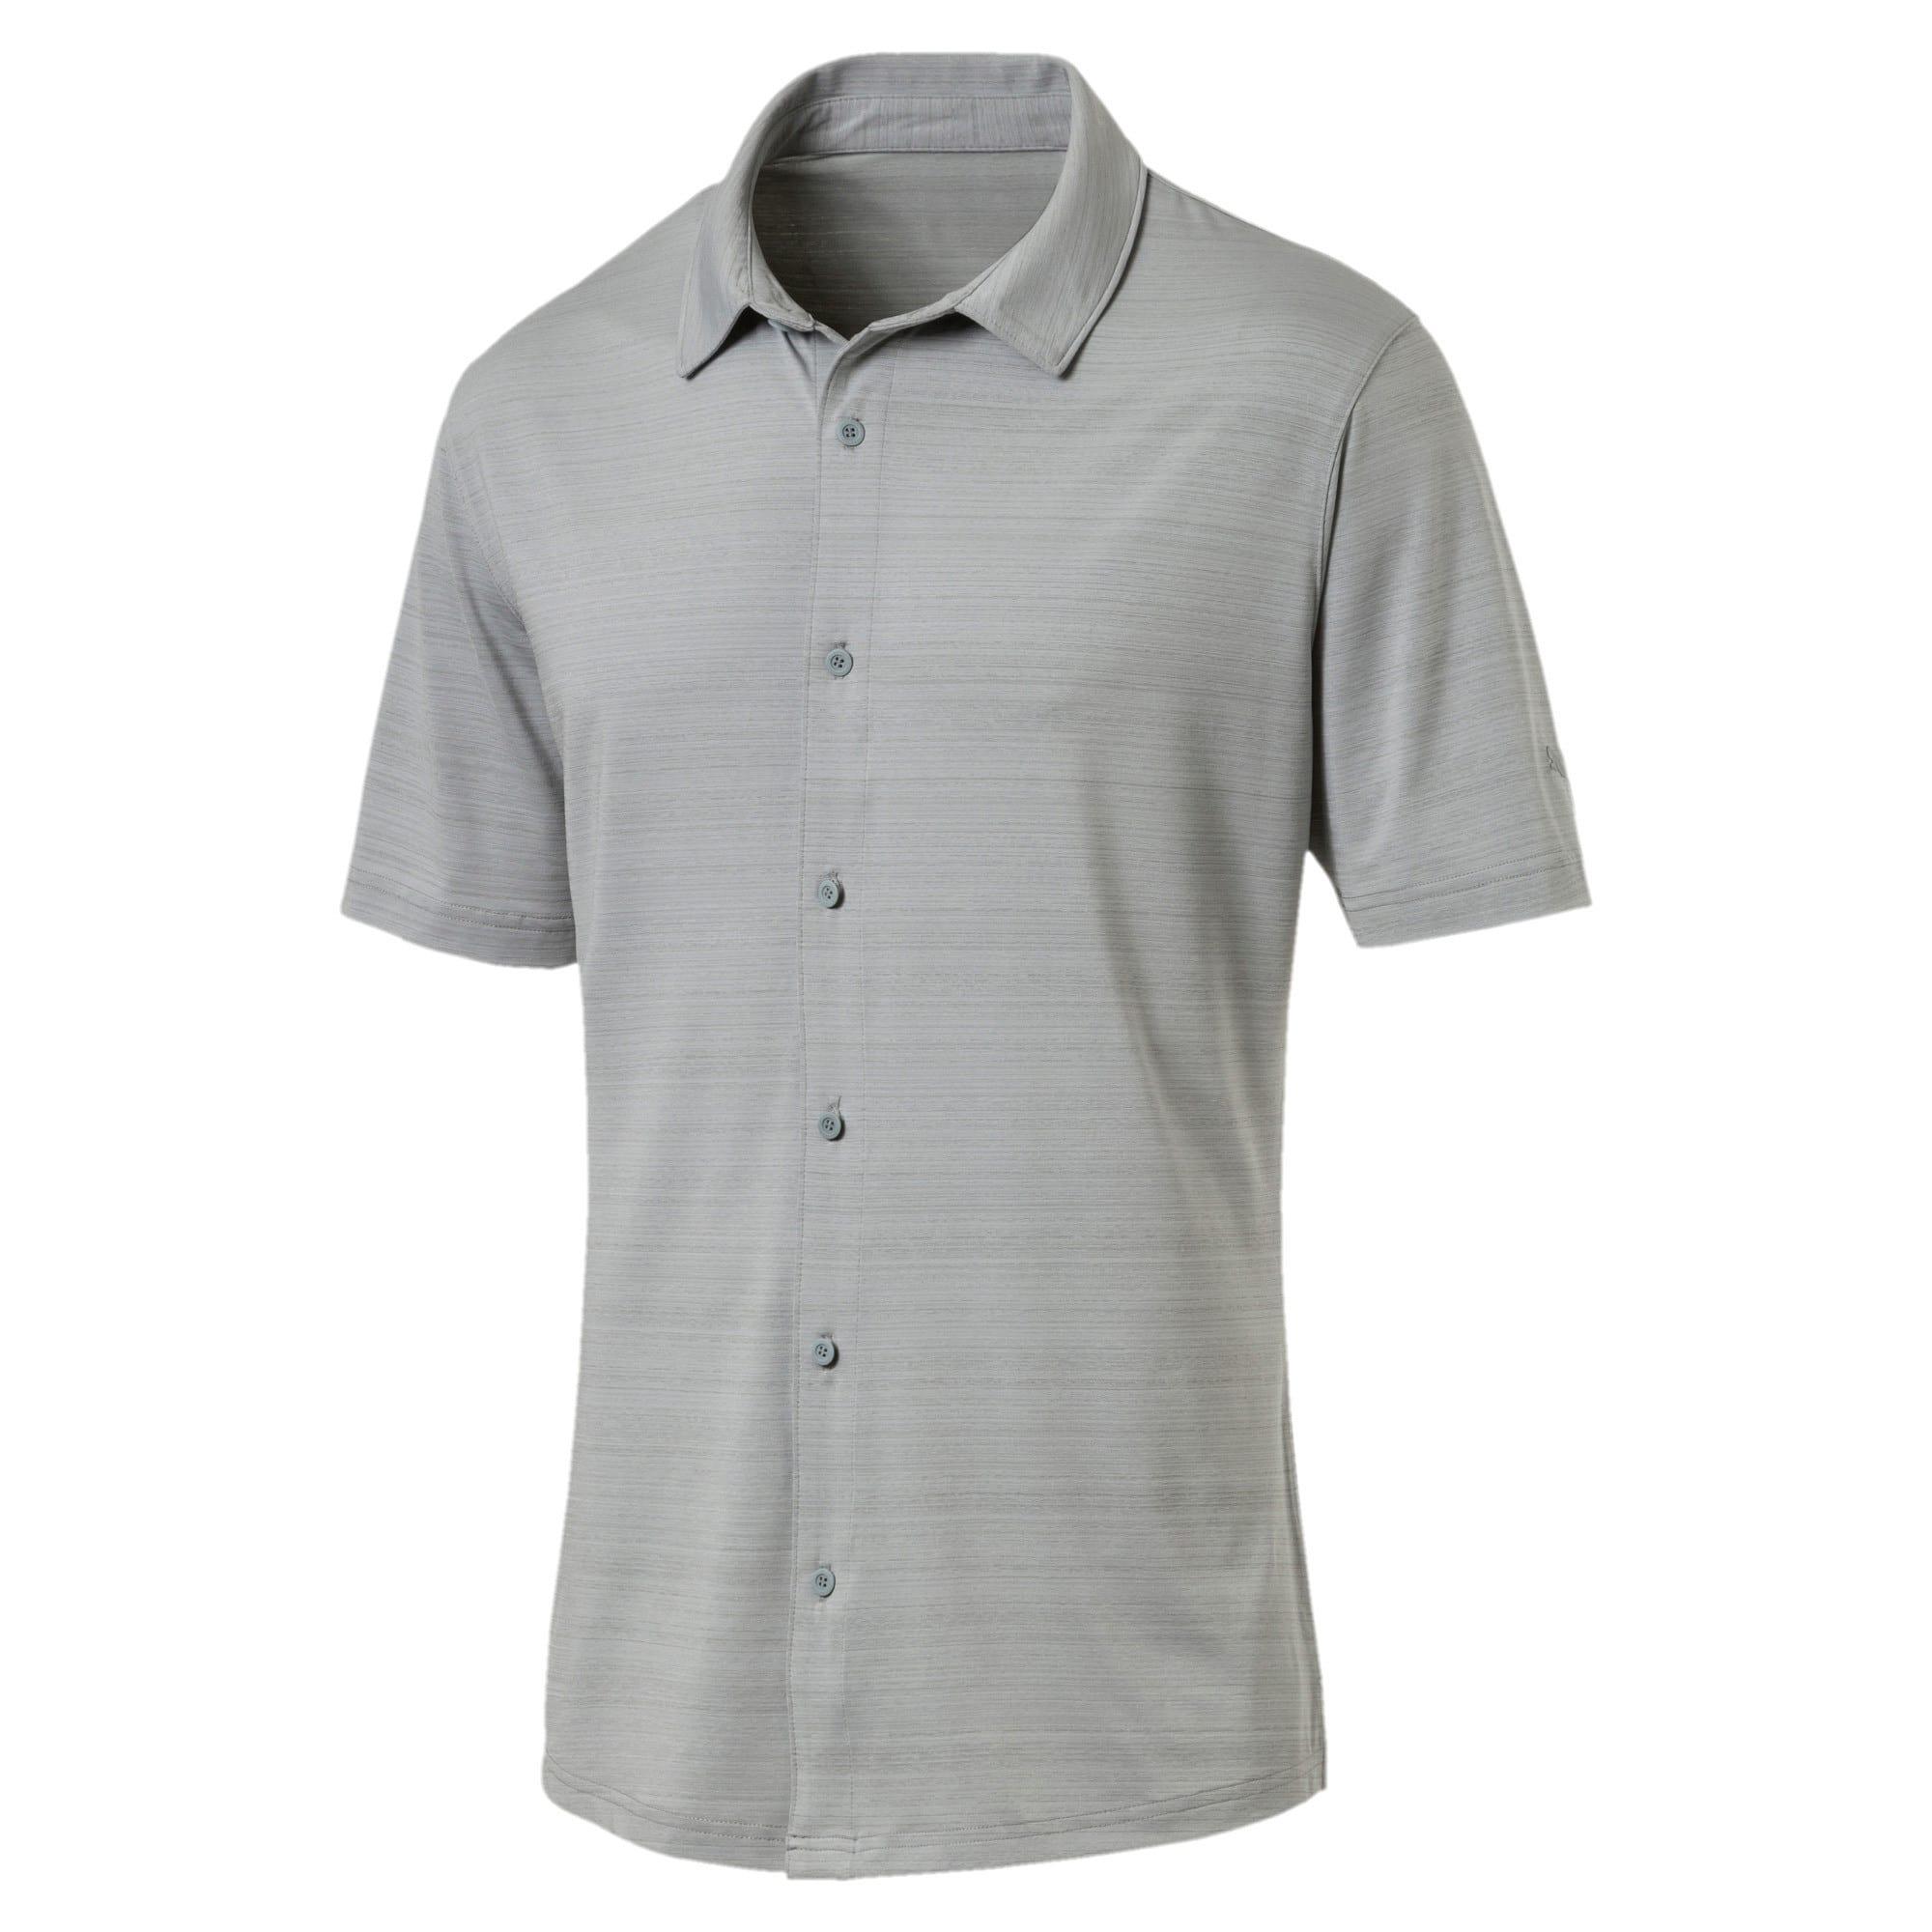 Thumbnail 4 of Breezer Short Sleeve Men's Golf Shirt, Quarry, medium-IND